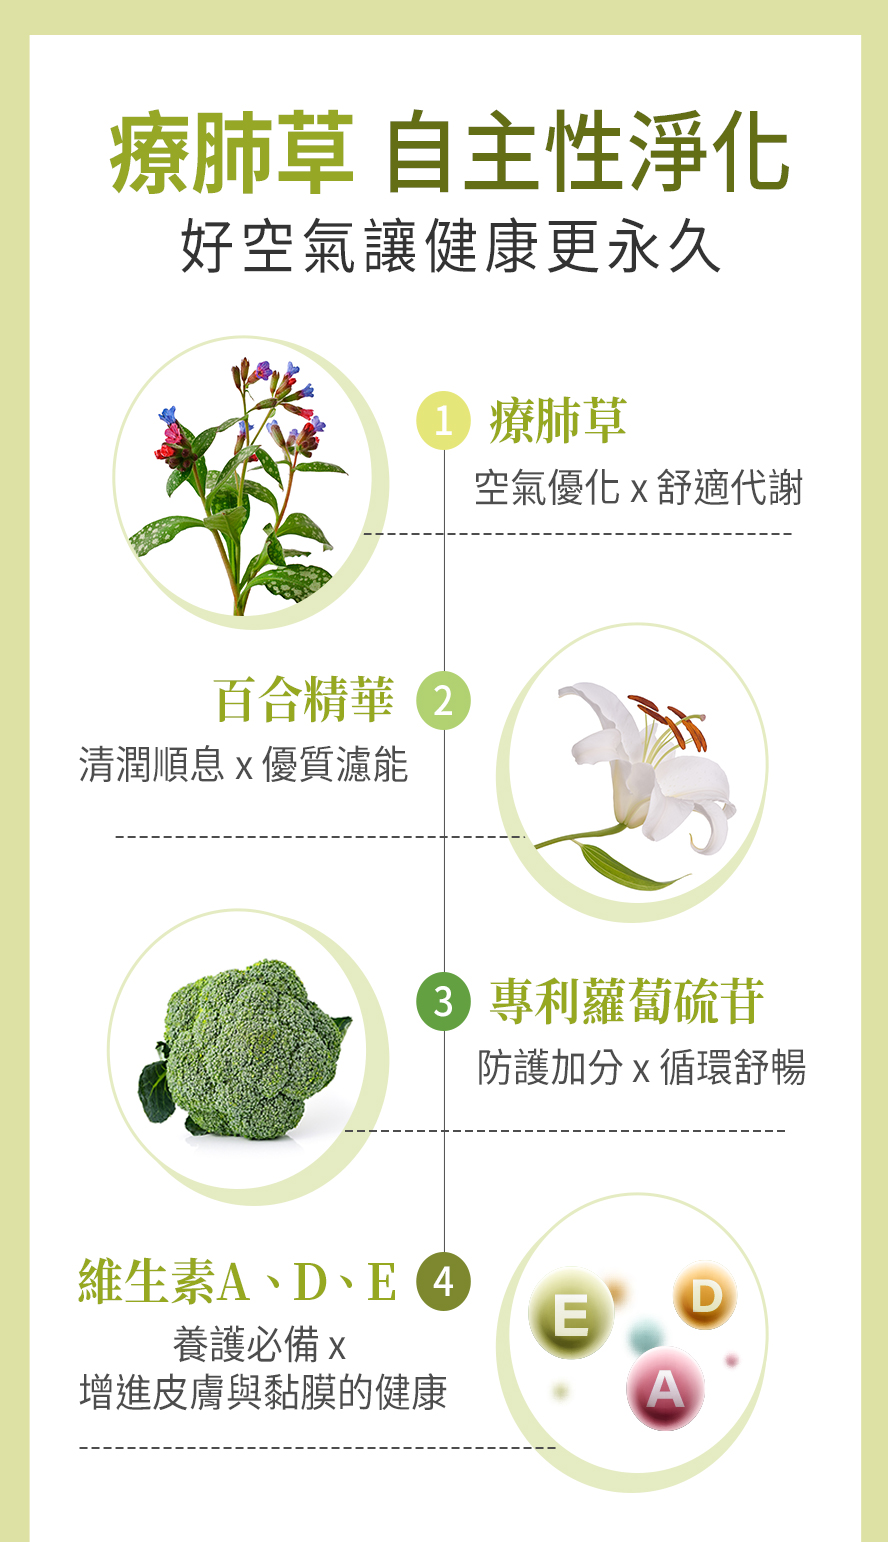 BHK's療肺草採用療肺草萃取物、百合濃縮粉、專利蘿蔔硫苷以及維生素A、D、E,讓體內空氣清新。